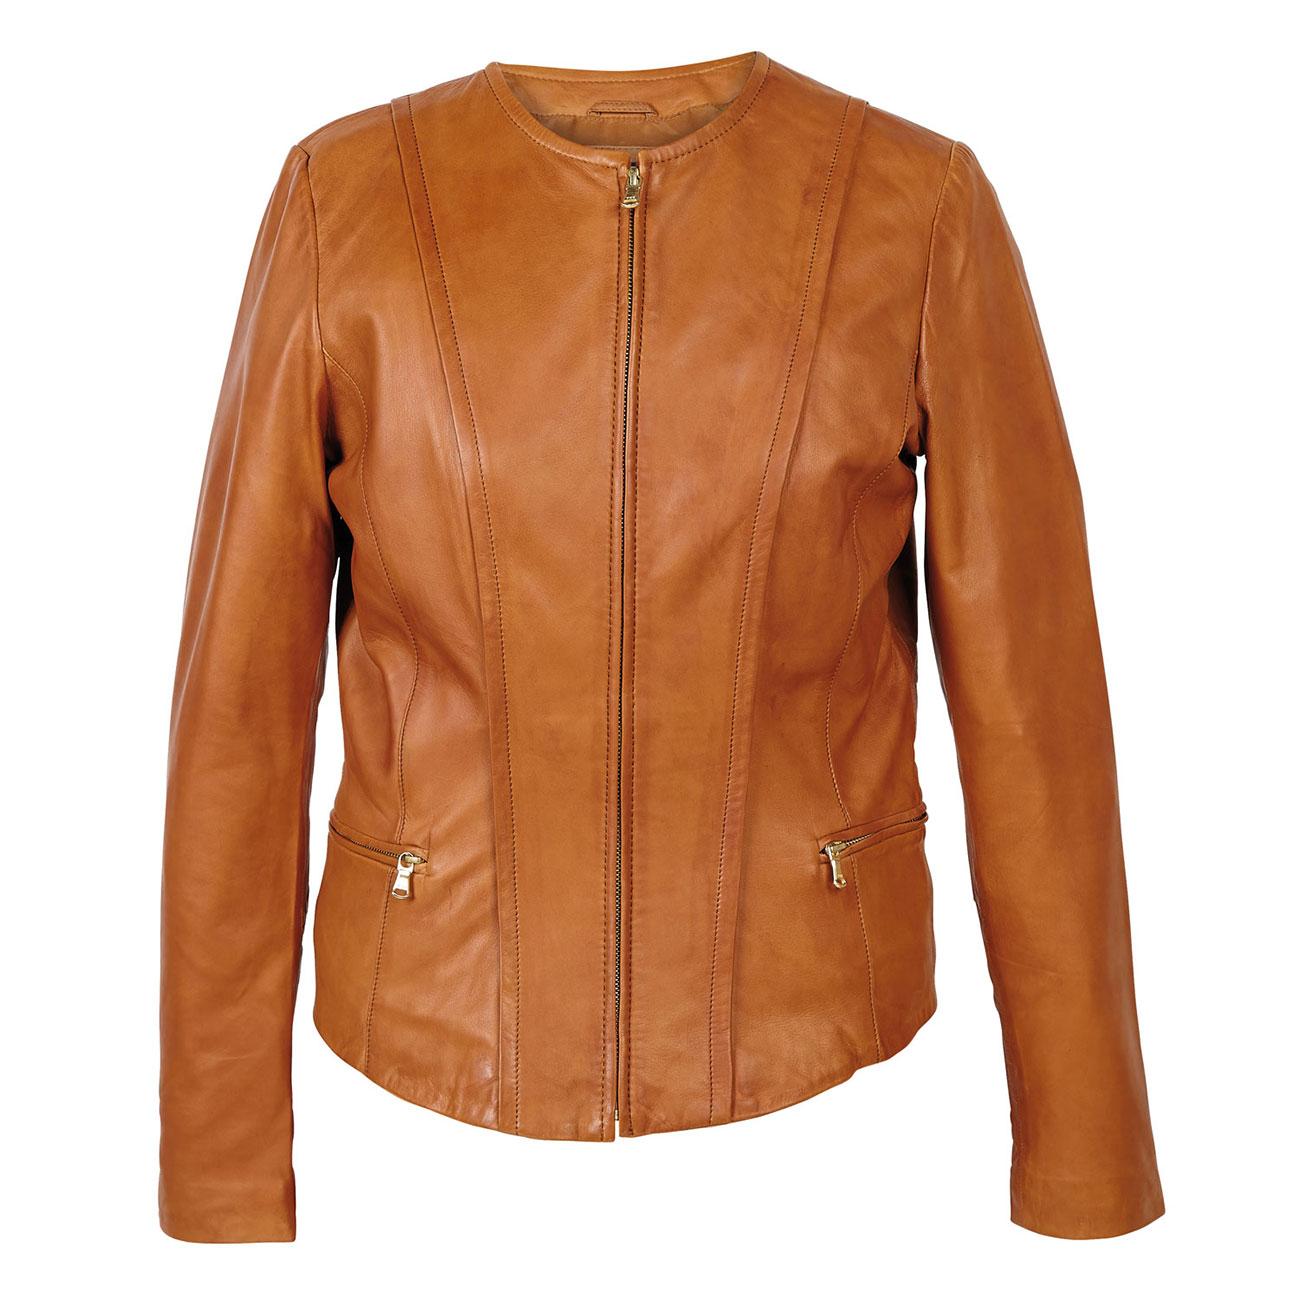 Women's Collarless Leather Jacket Tan: Sopie